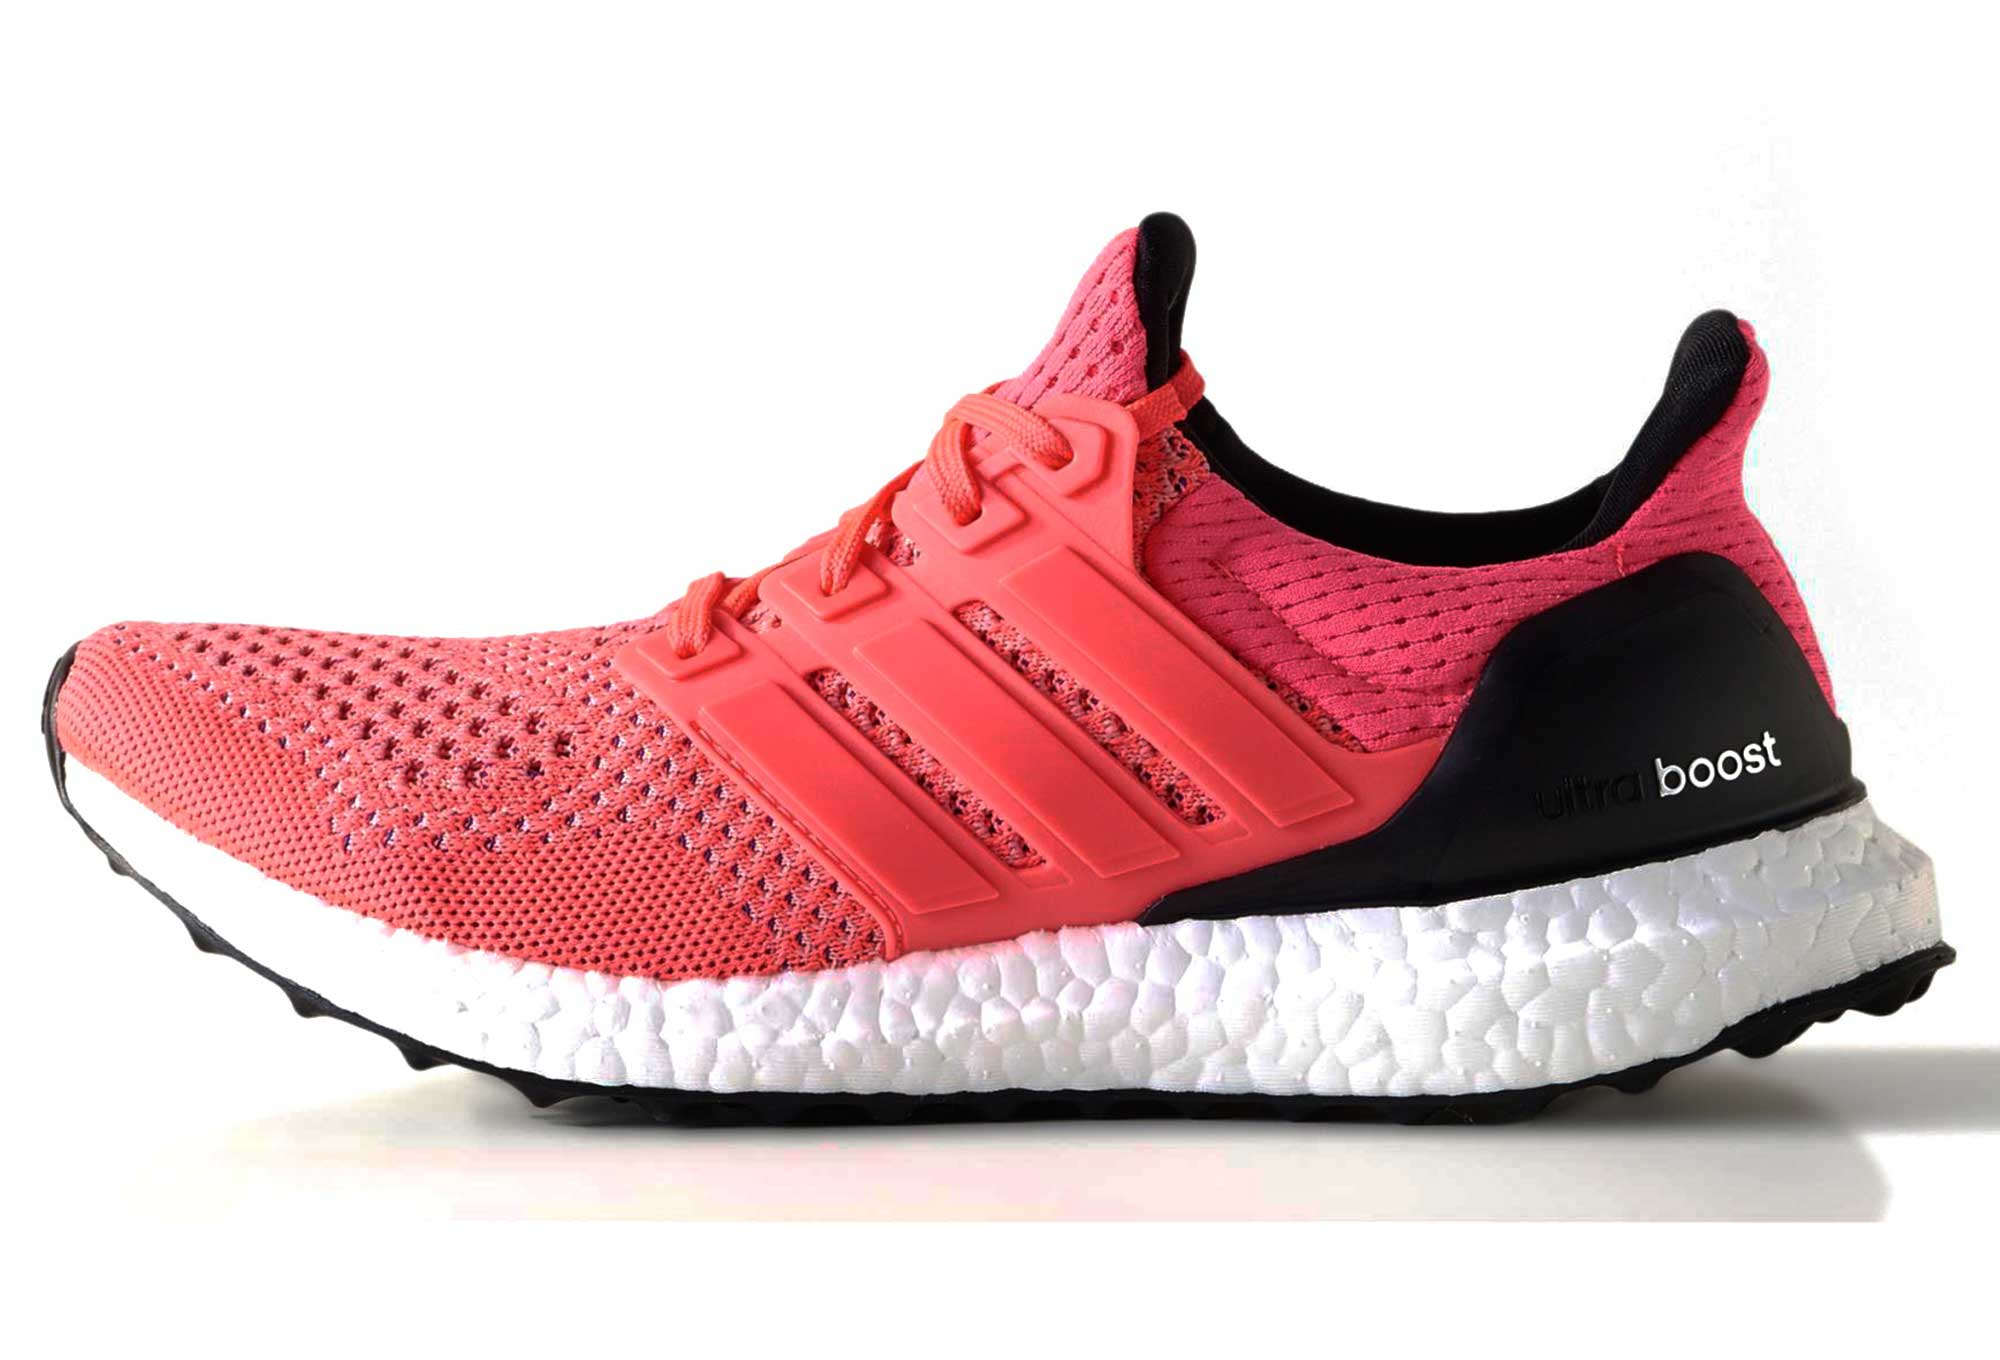 chaussures de running femme adidas running ultra boost rose. Black Bedroom Furniture Sets. Home Design Ideas